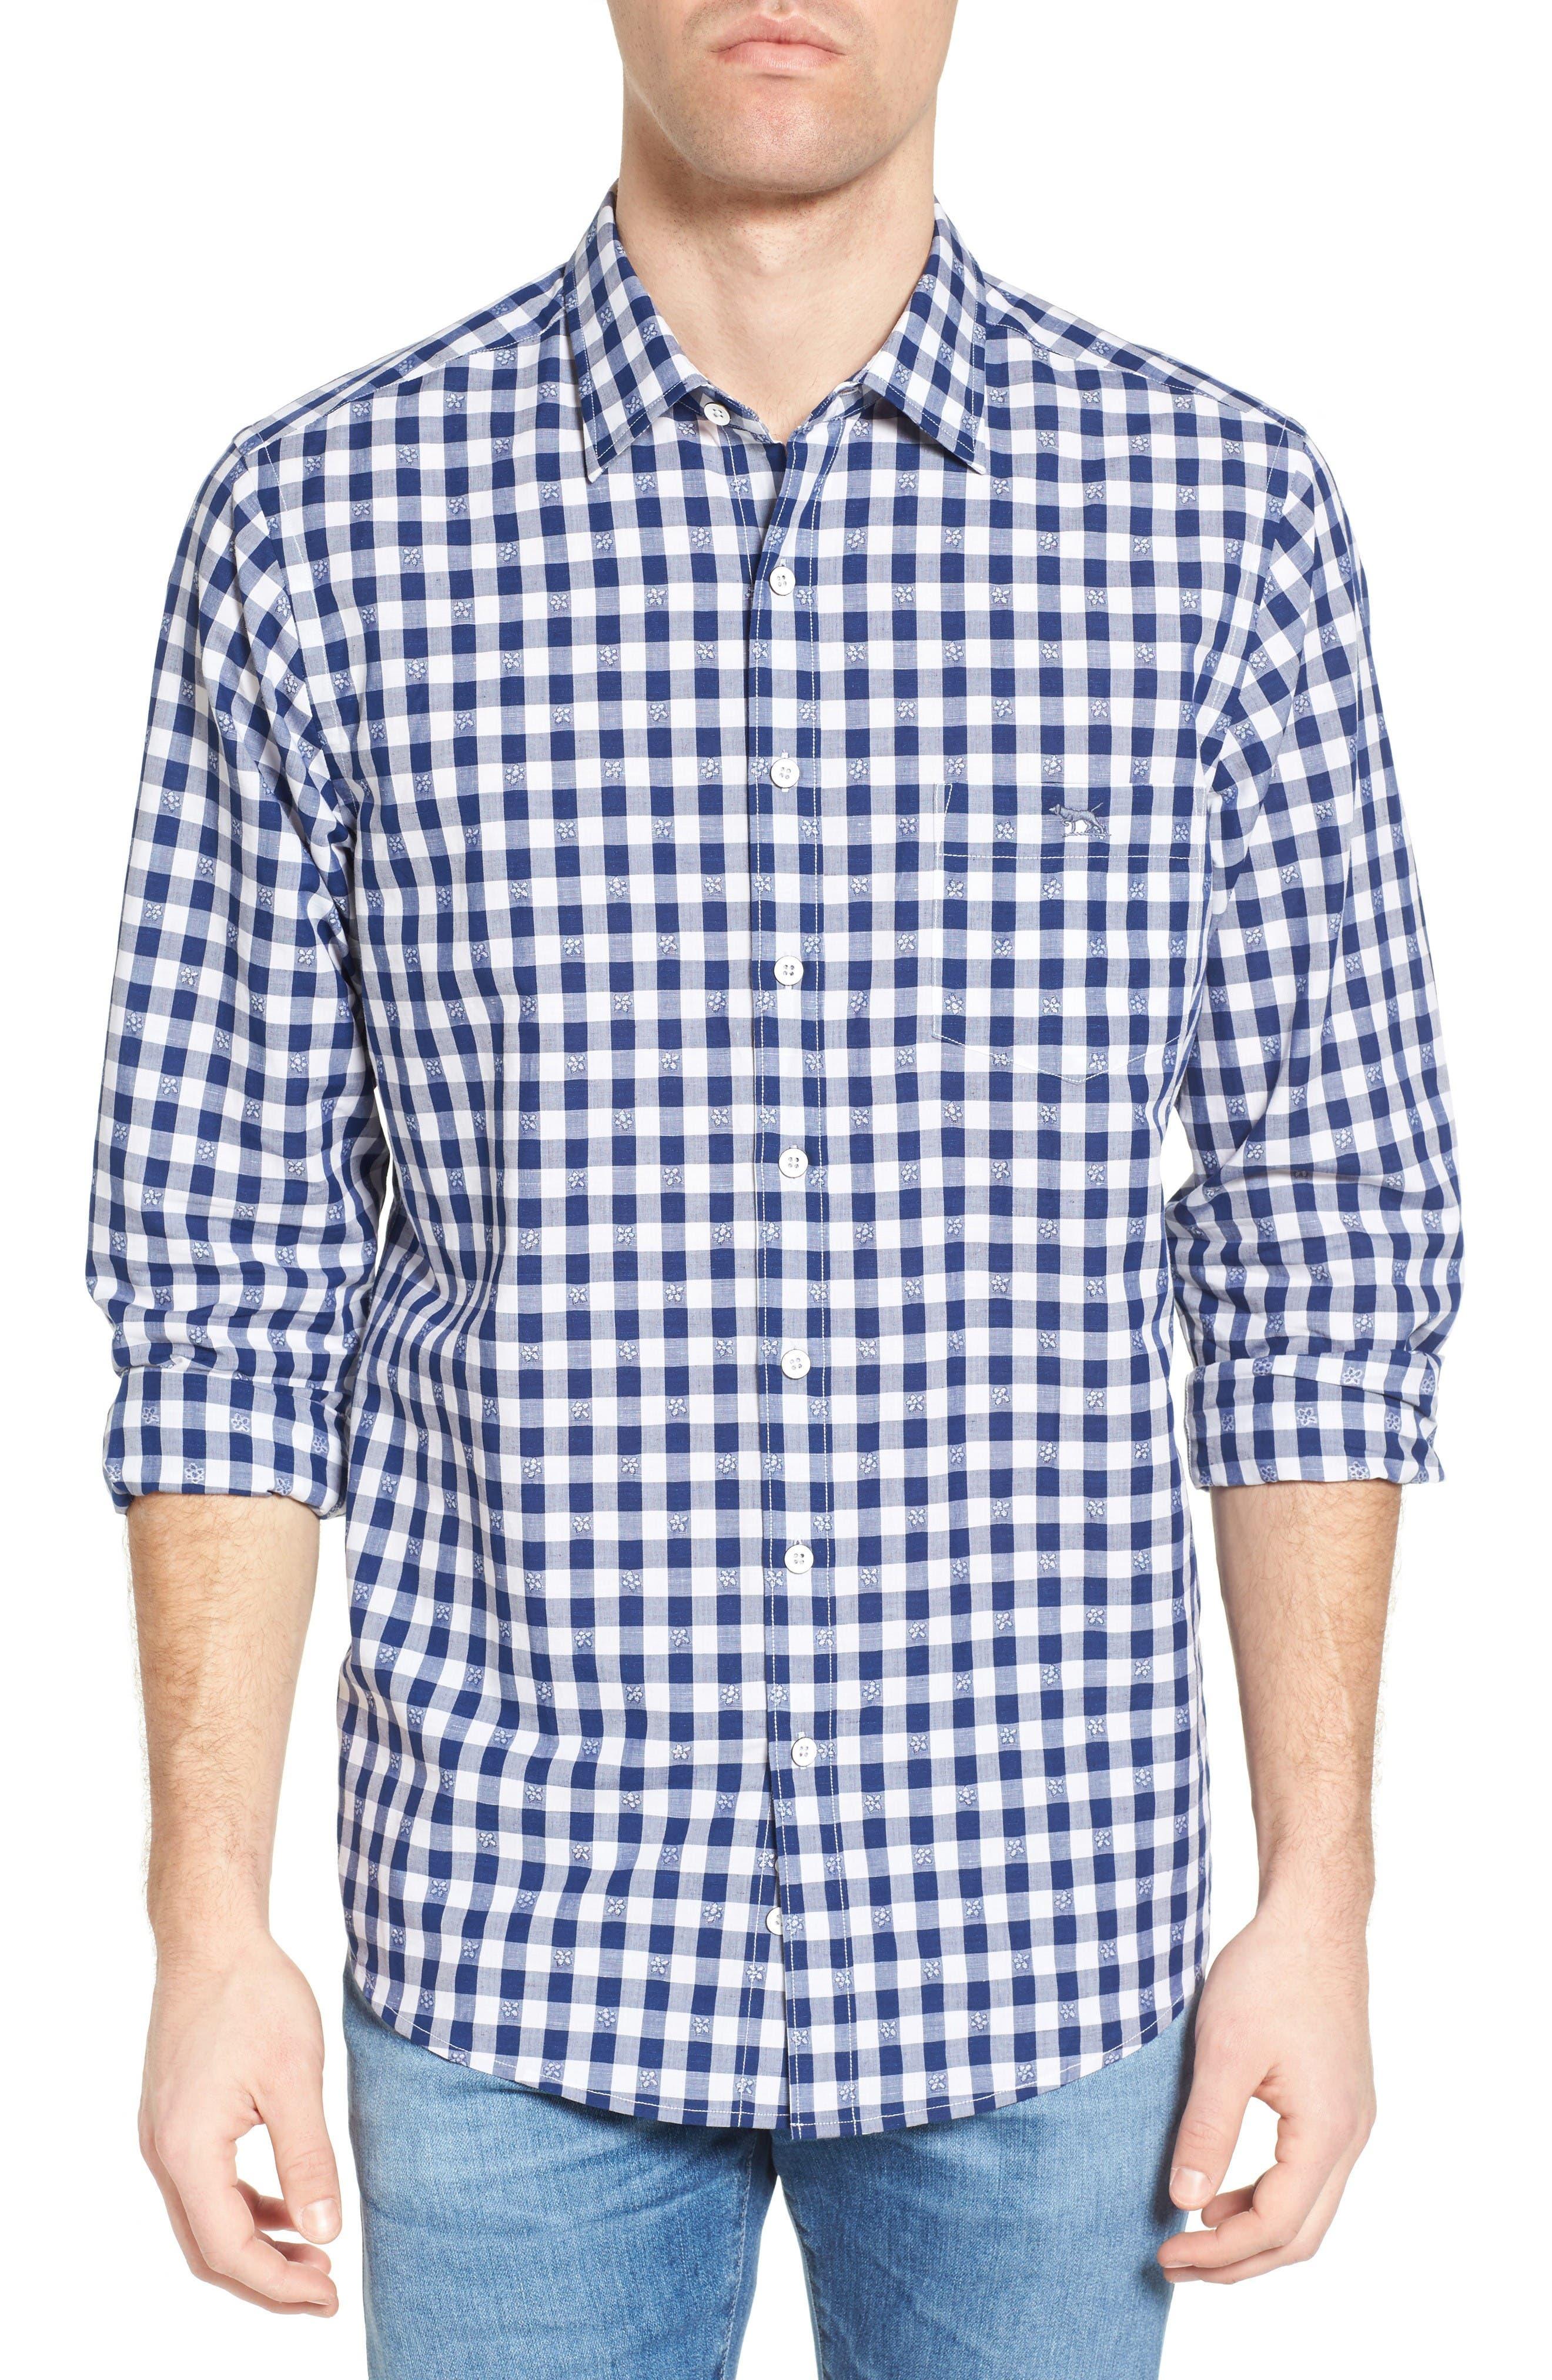 Main Image - Rodd & Gunn Wallace Floral Check Sport Shirt